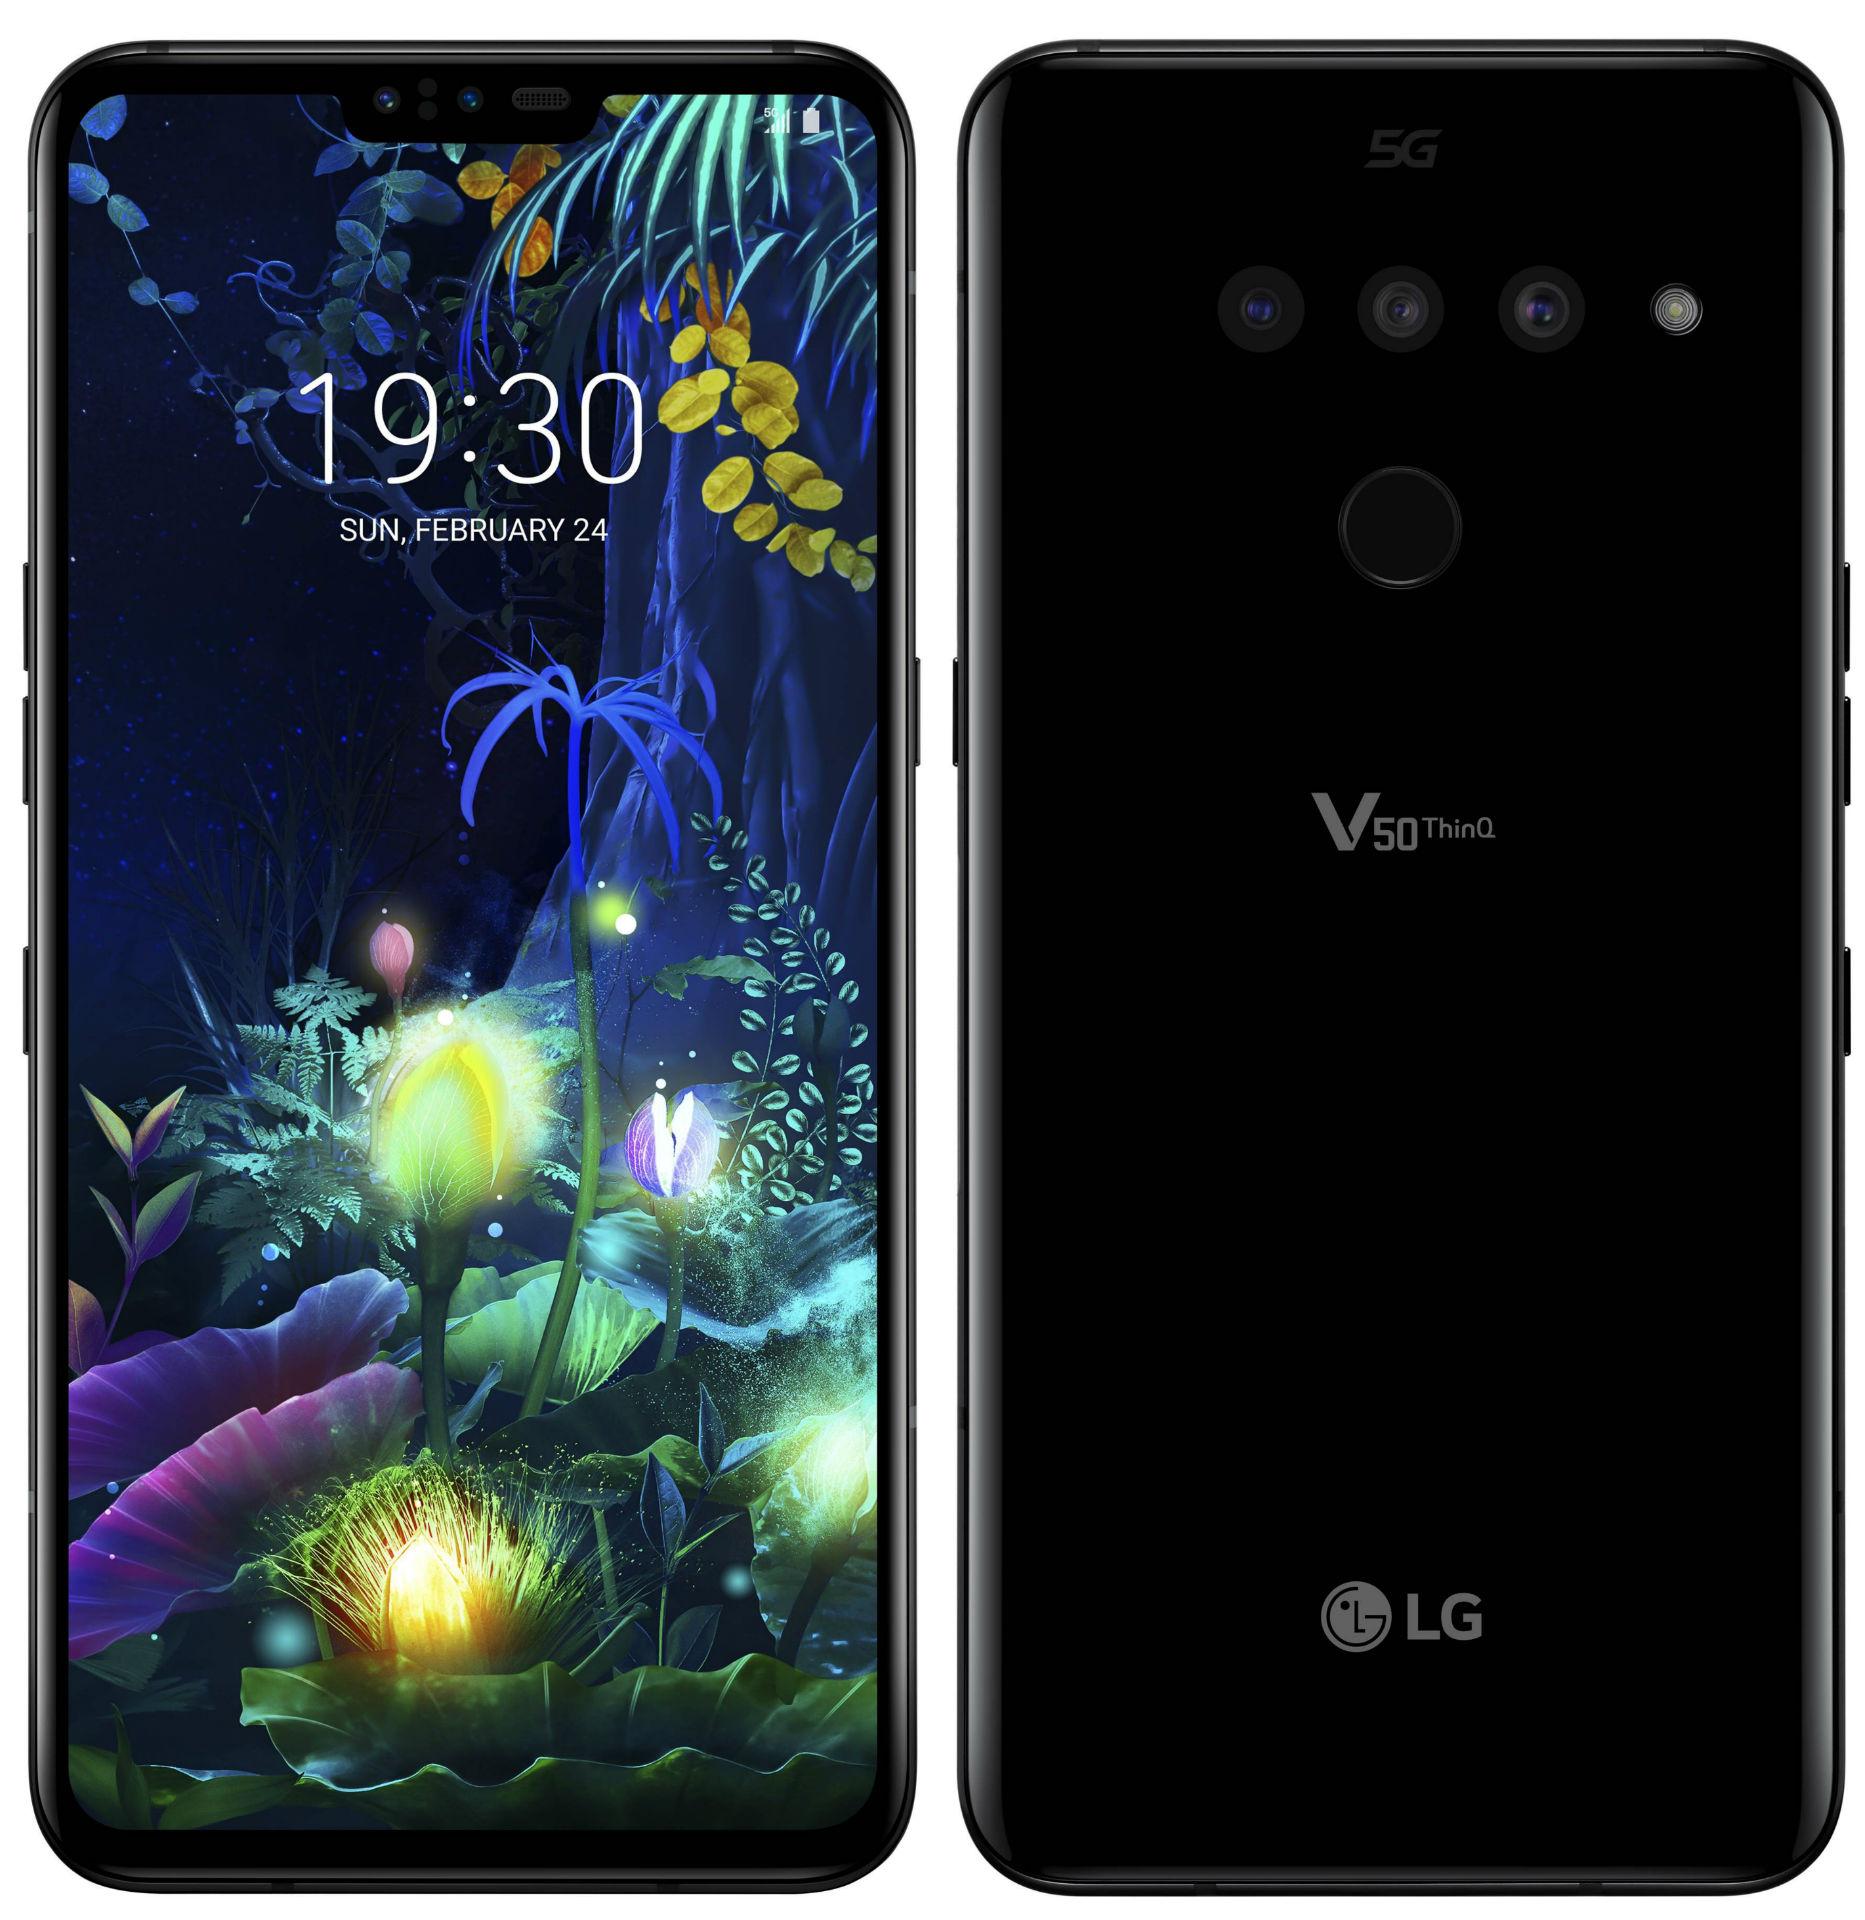 LG представила свой первый 5G смартфон – LG V50ThinQ 5G | Mobile-review.com  — Новости